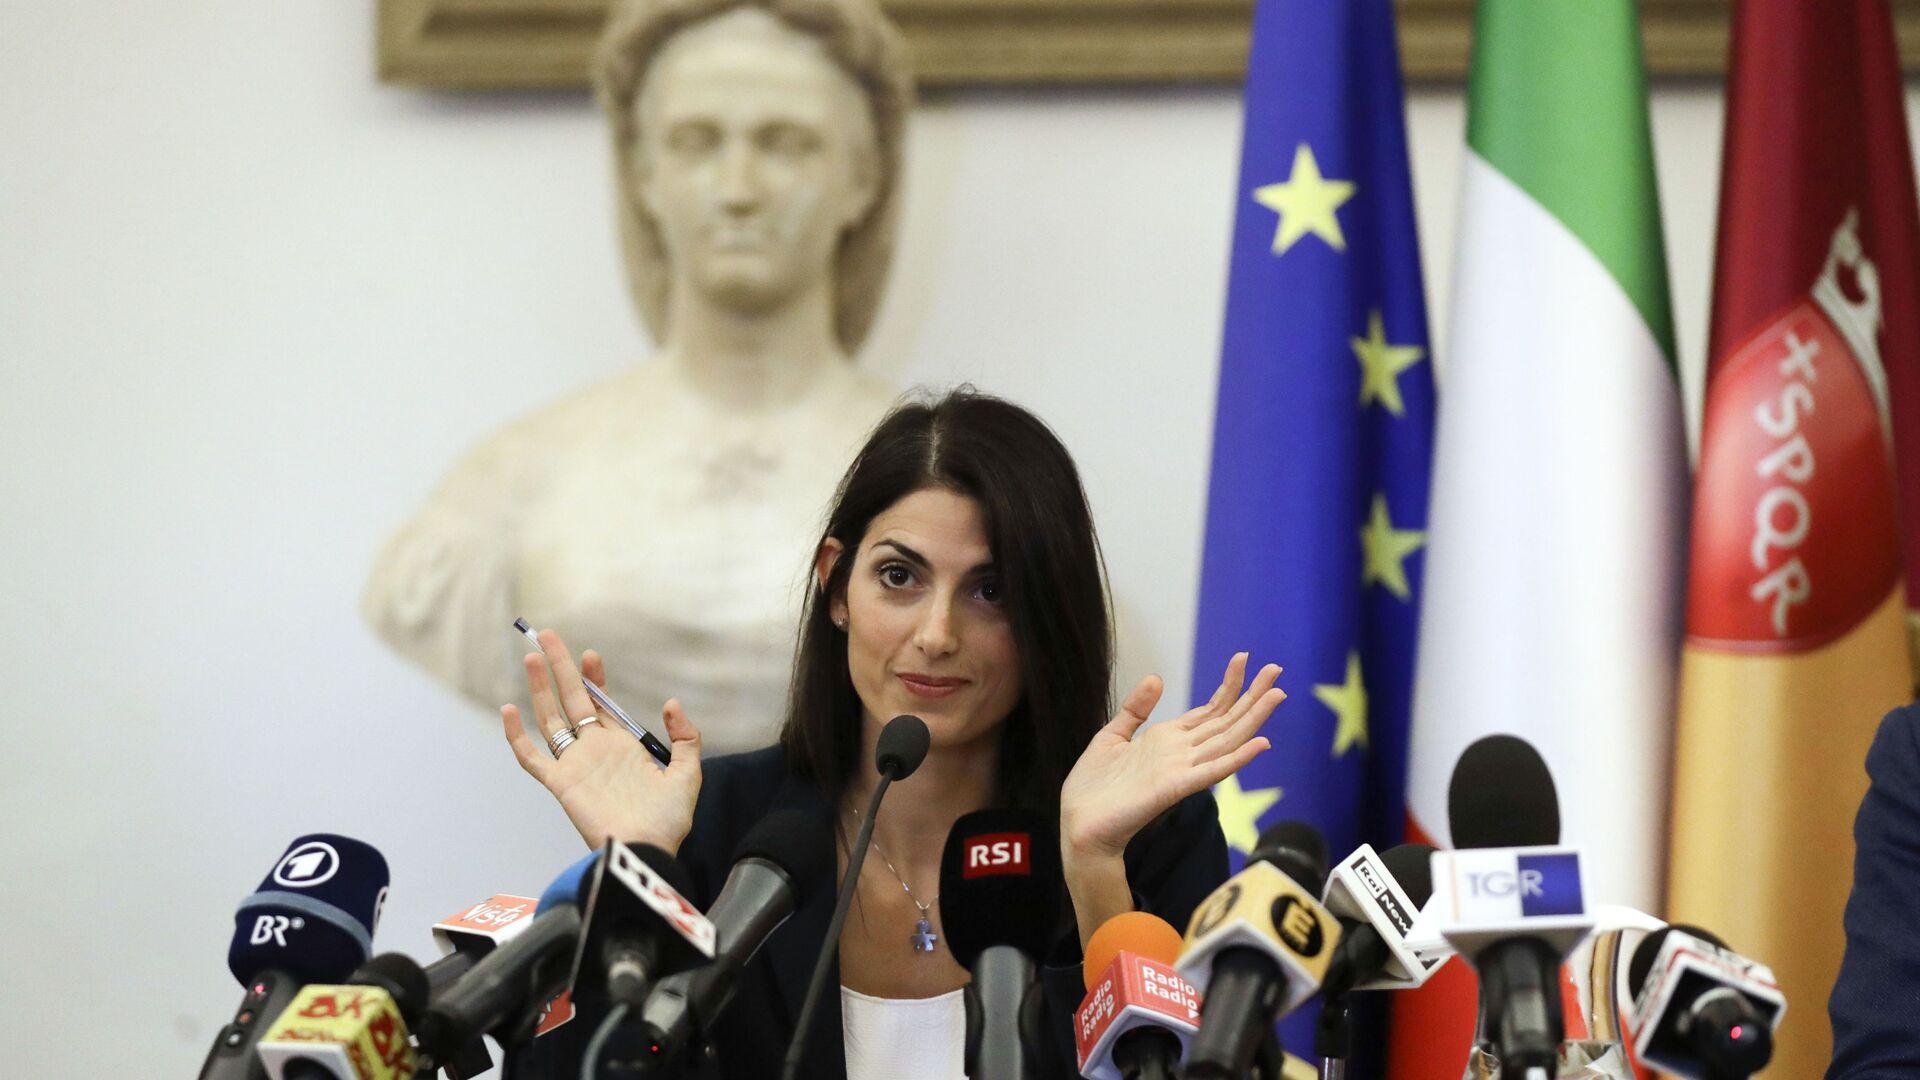 Virginia Raggi, sindaco di Roma - Sputnik Italia, 1920, 26.05.2021